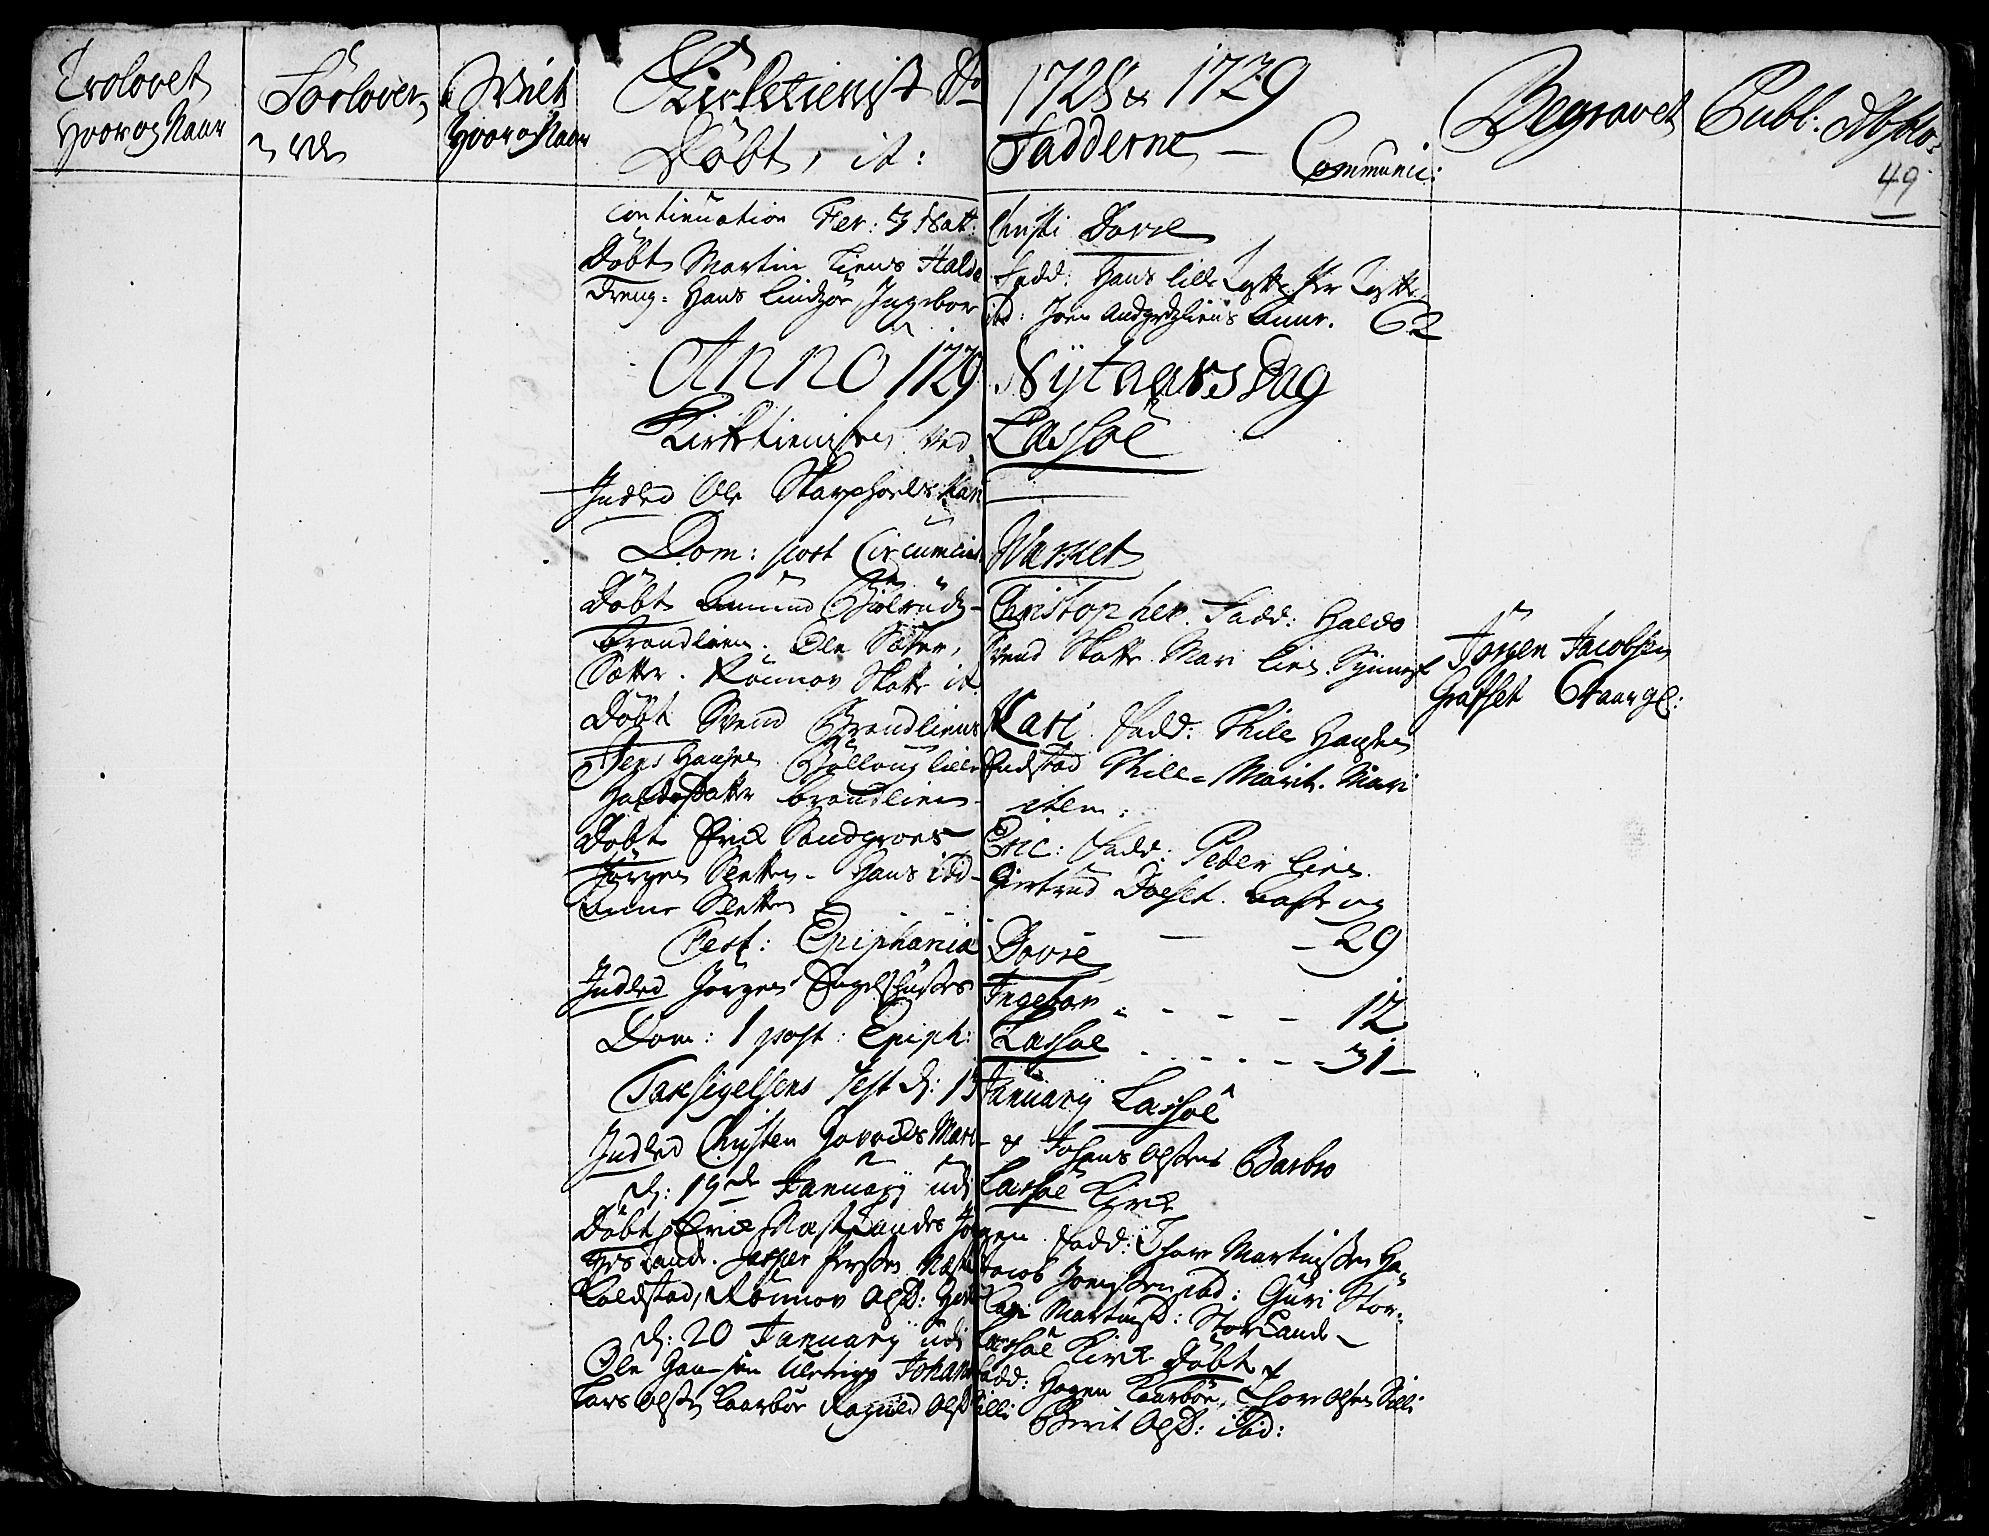 SAH, Lesja prestekontor, Ministerialbok nr. 1, 1724-1731, s. 49